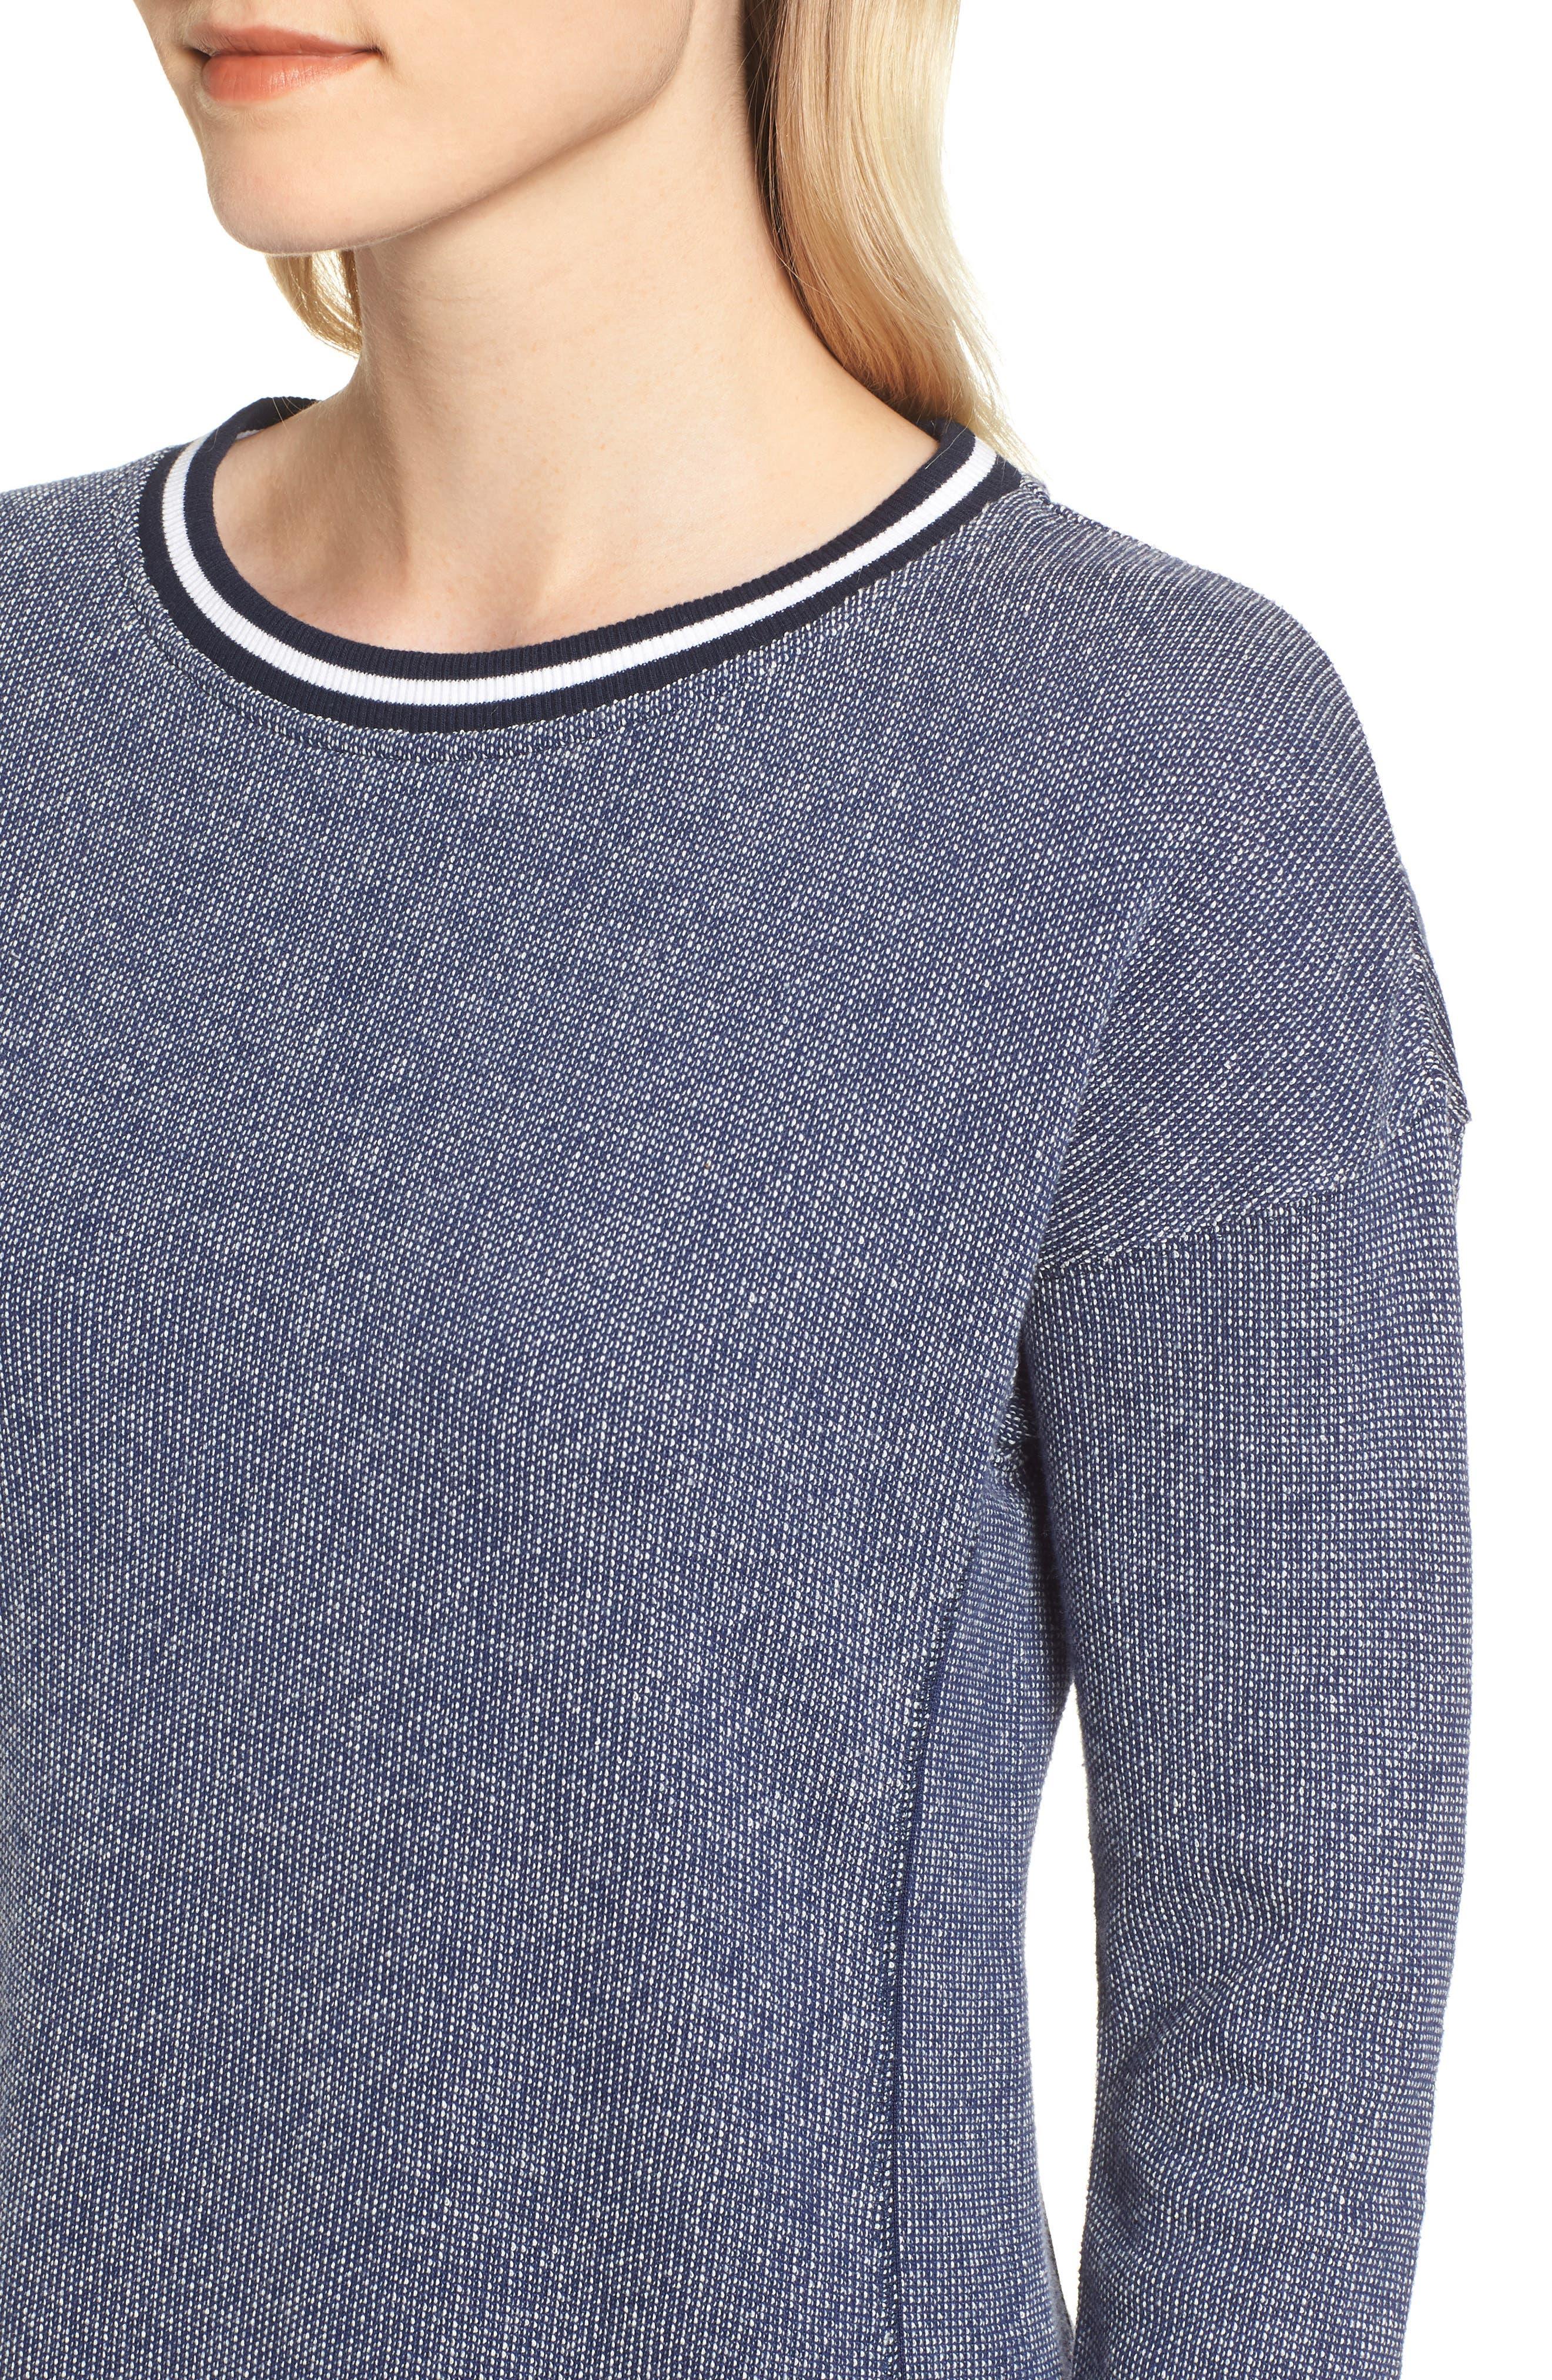 Sweatshirt Dress,                             Alternate thumbnail 4, color,                             476